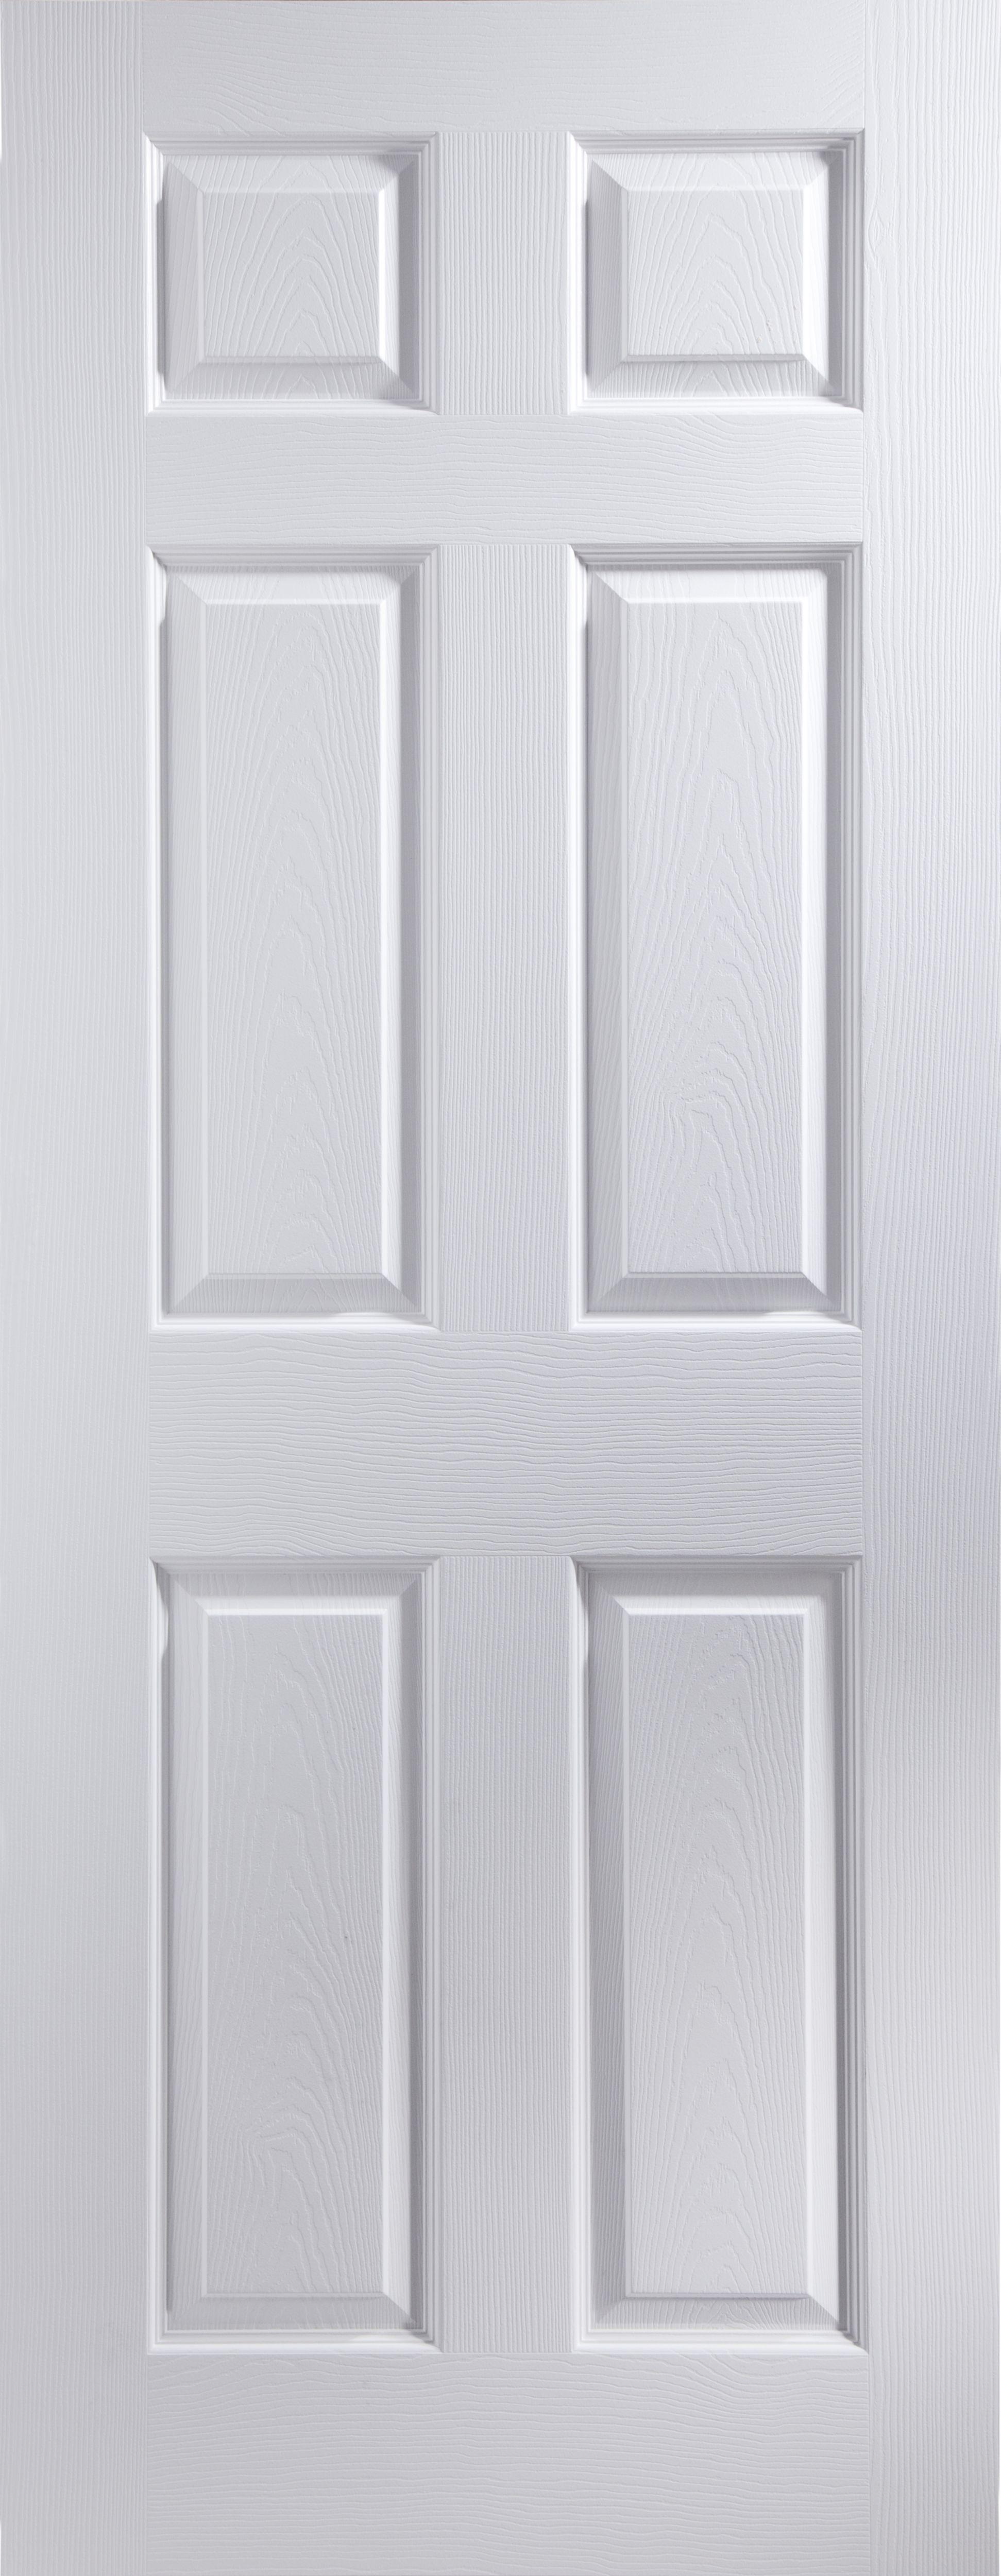 panel pre painted white woodgrain internal unglazed door h 2040mm. Black Bedroom Furniture Sets. Home Design Ideas